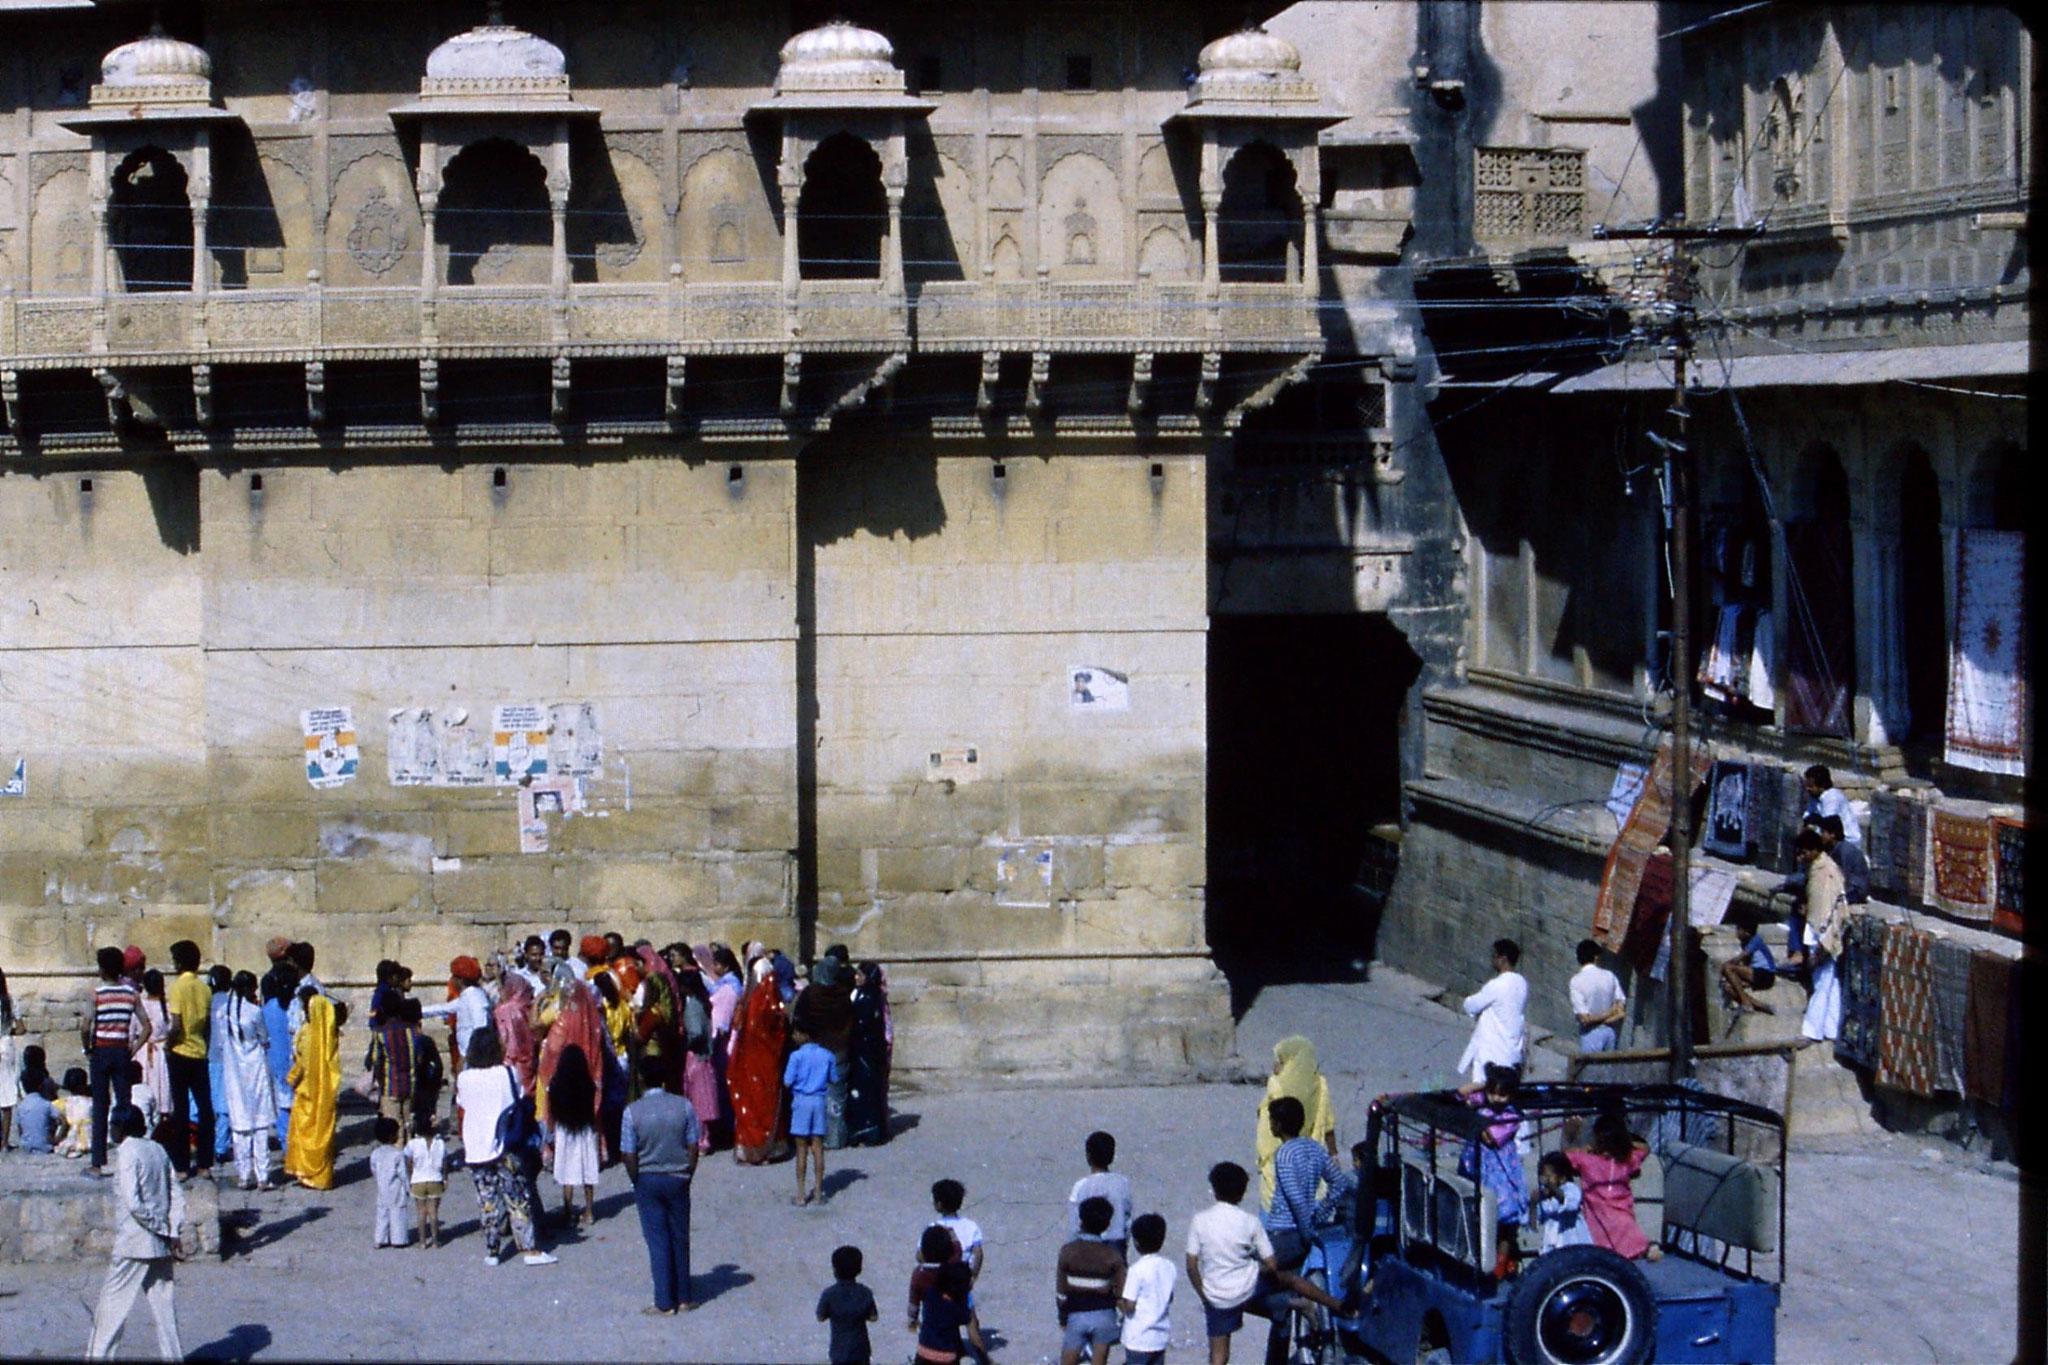 3/12/1989: 1: Jaisalmer wedding procession